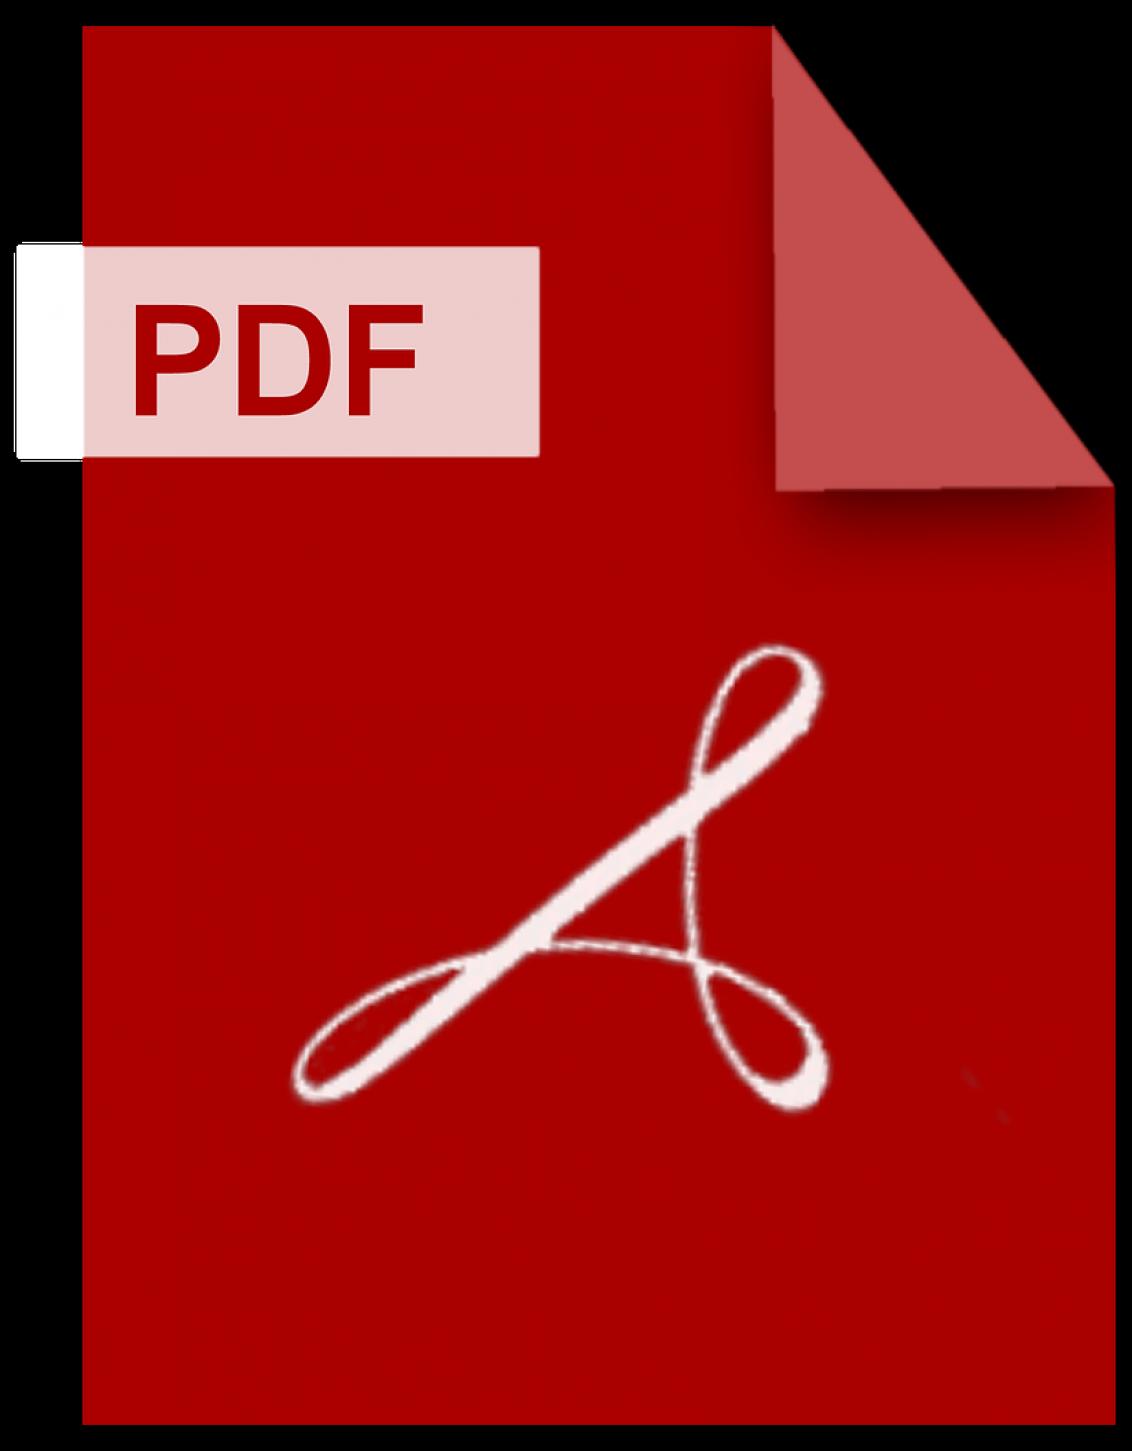 logo_documento_pdg